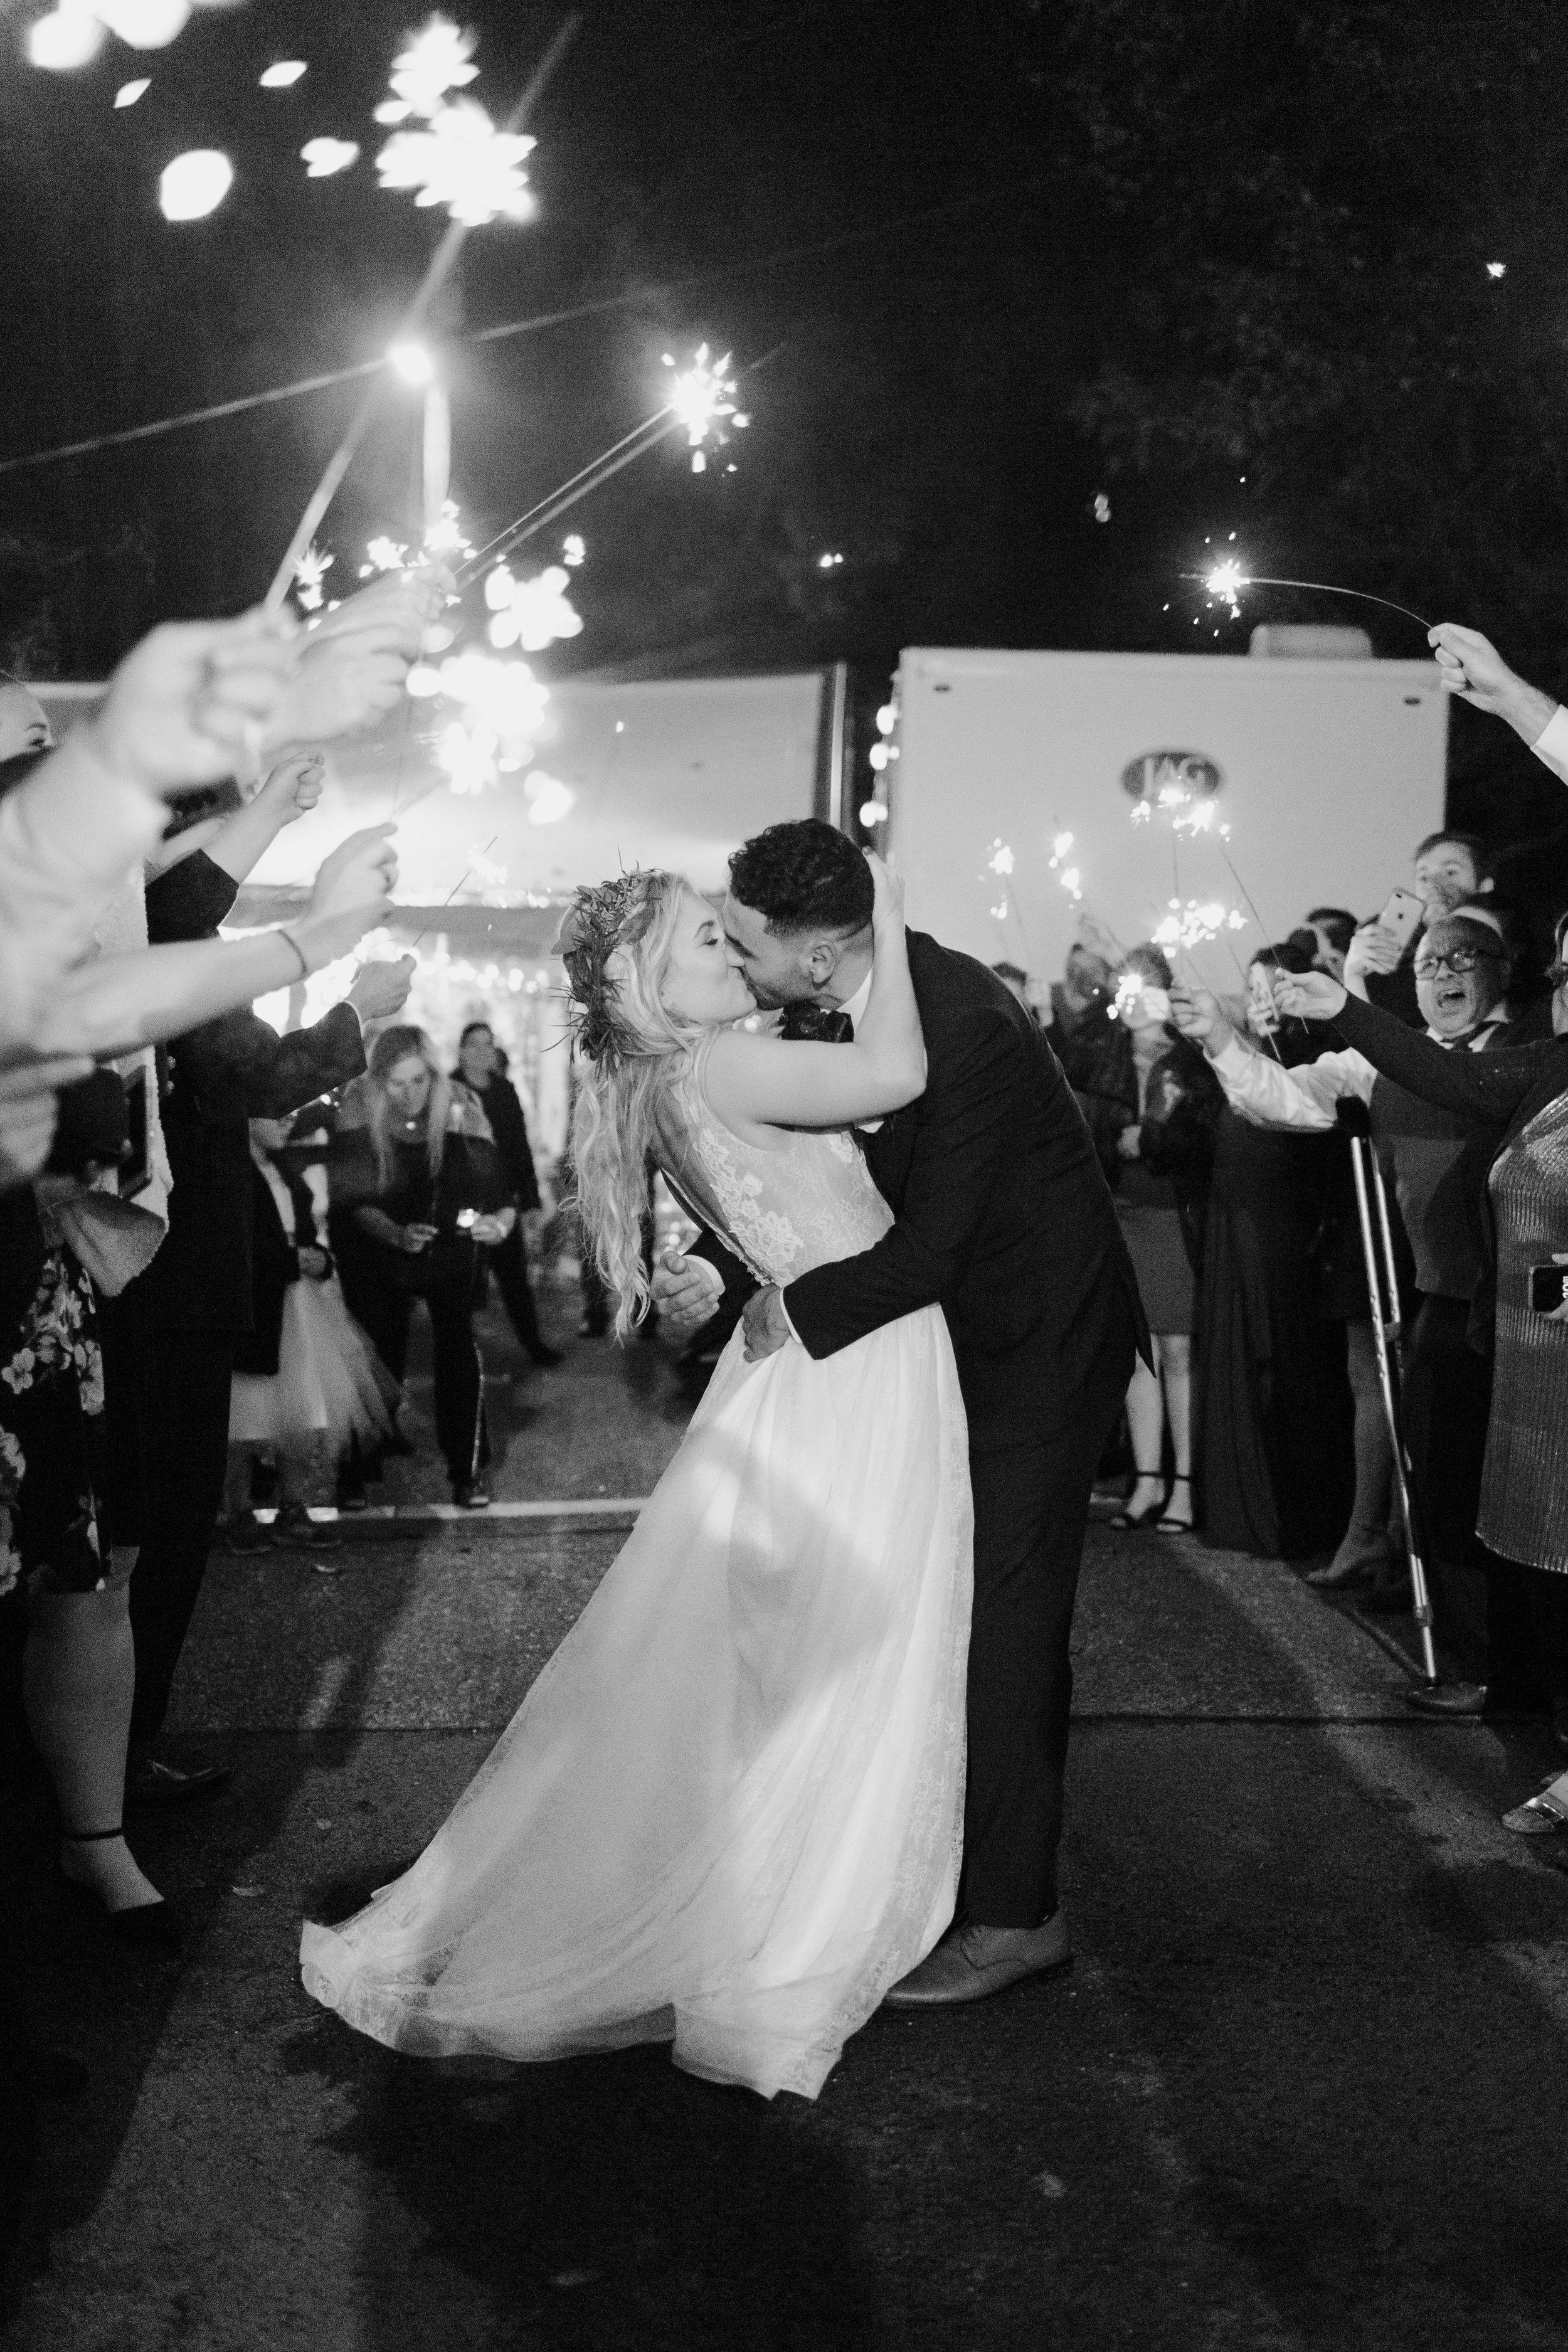 knoxville-wedding-photographer-259.JPG